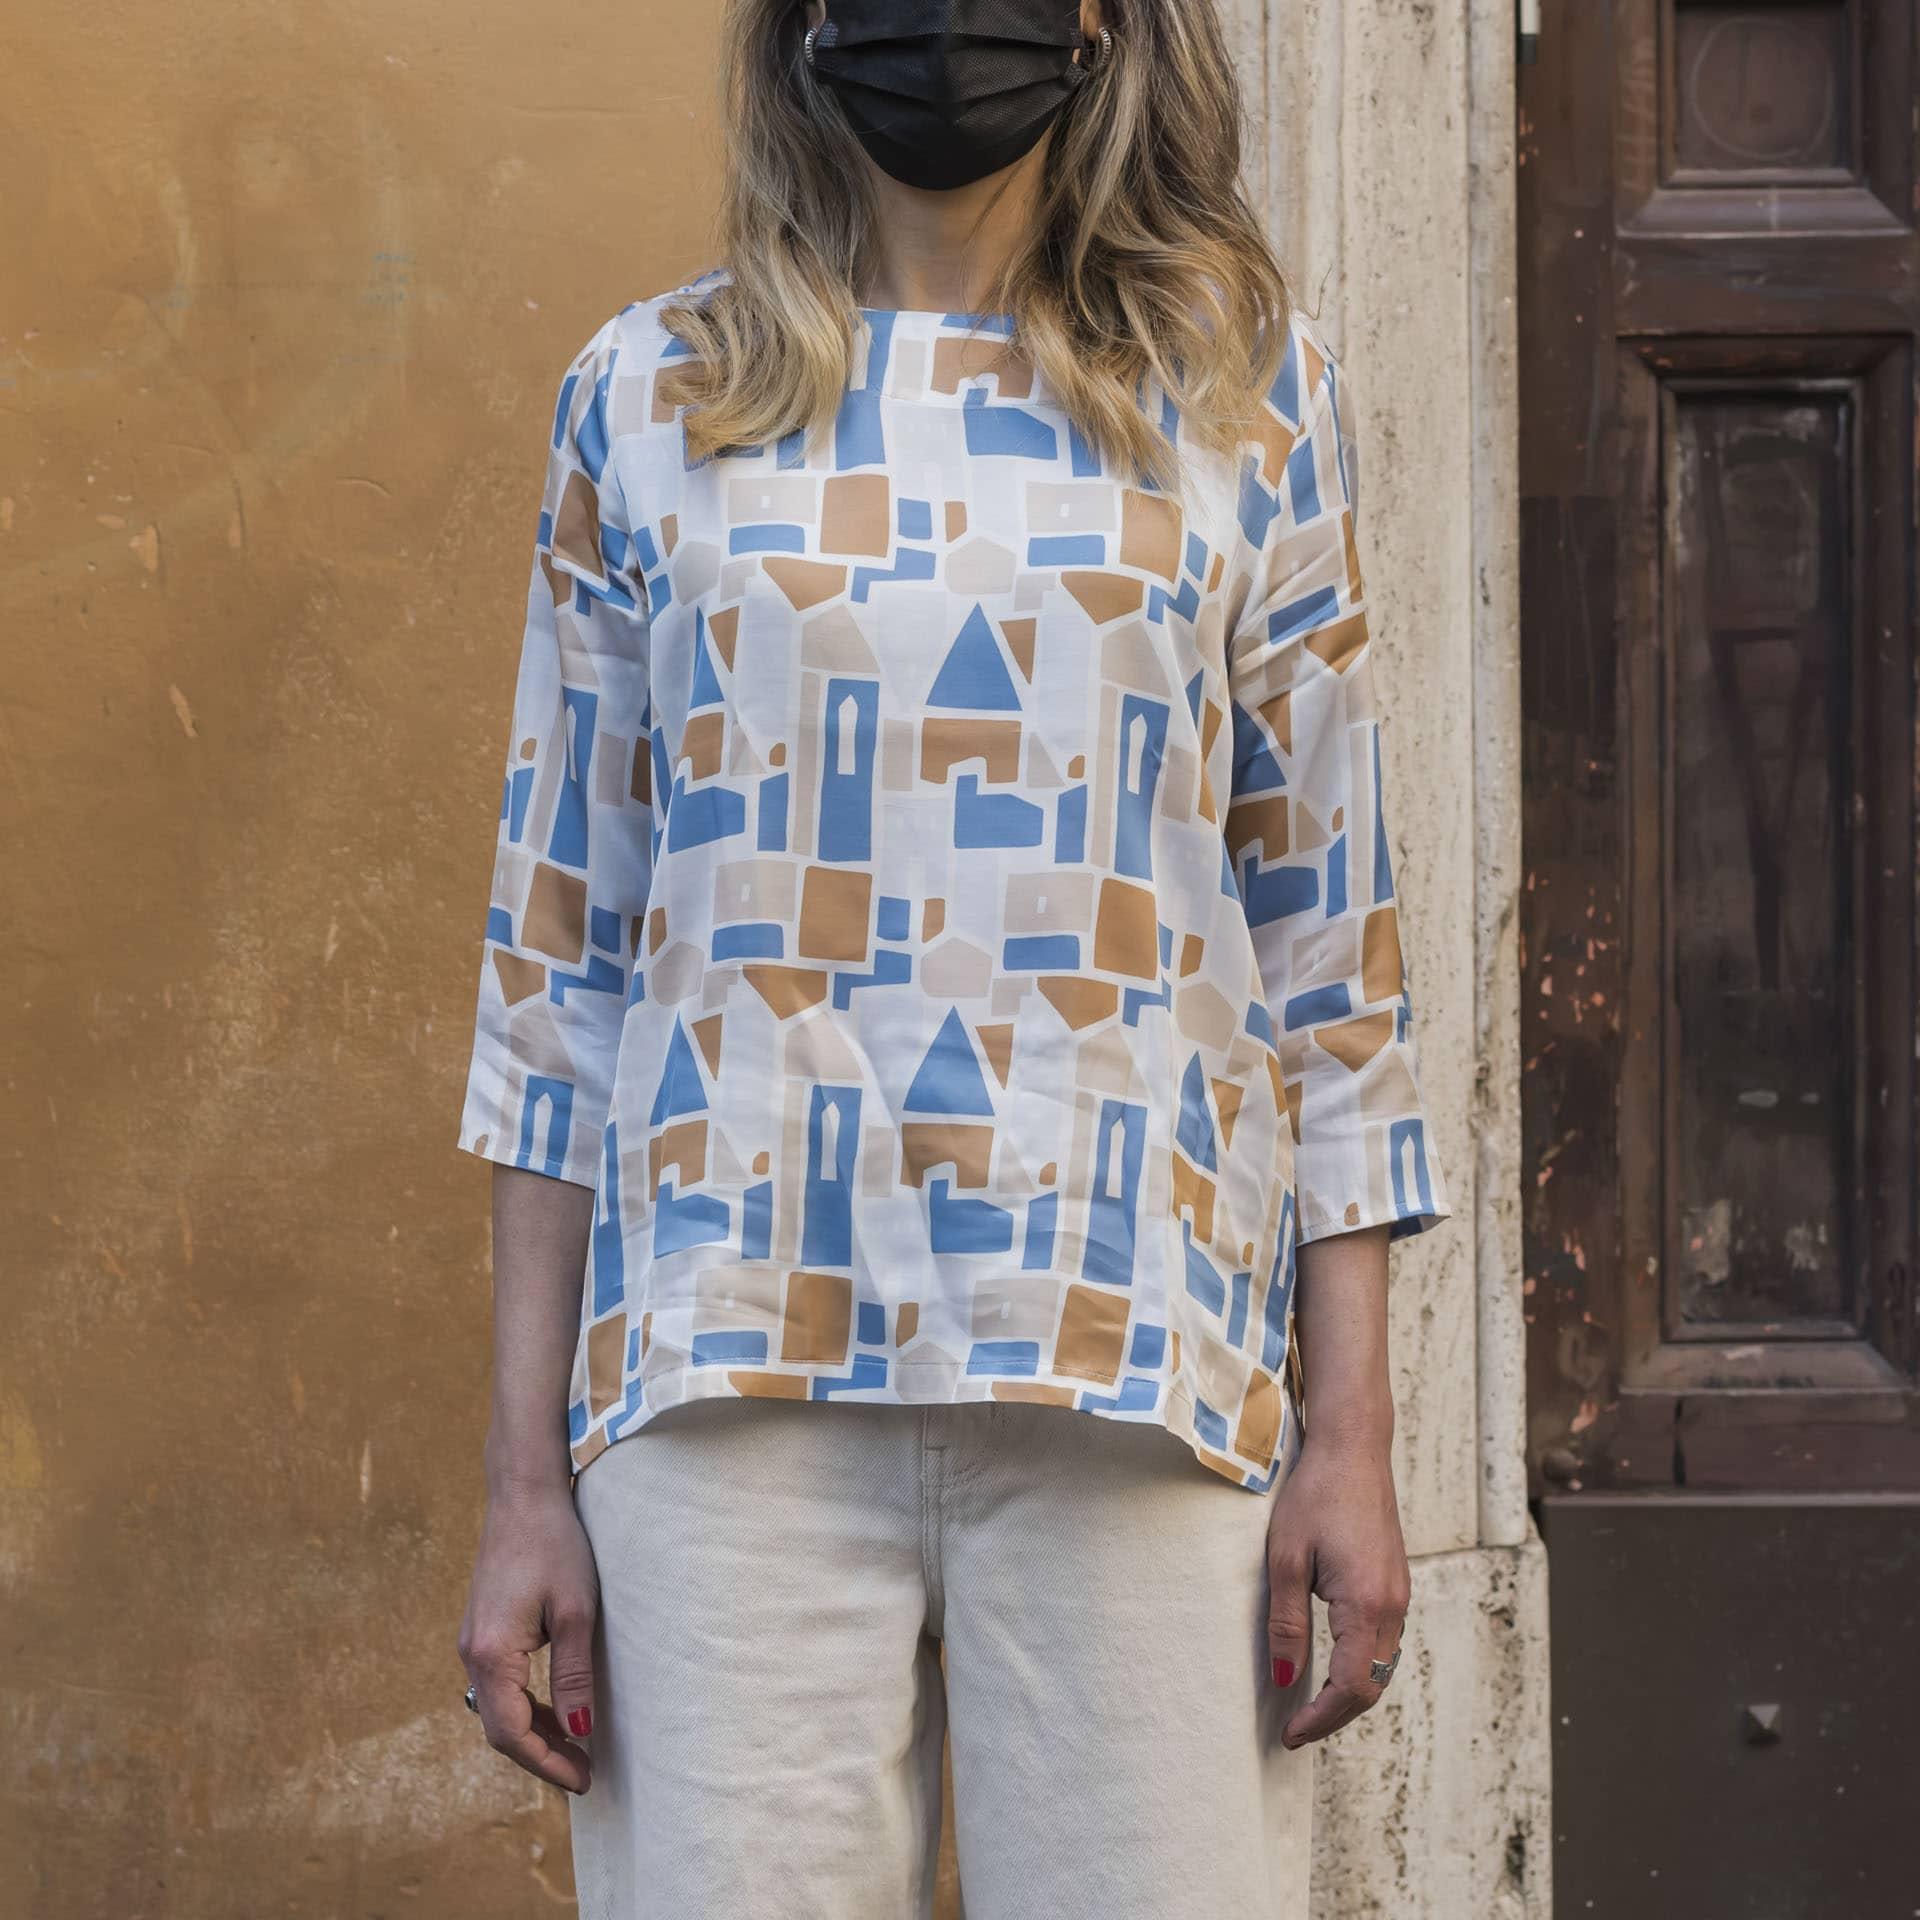 Hang On blusa casette